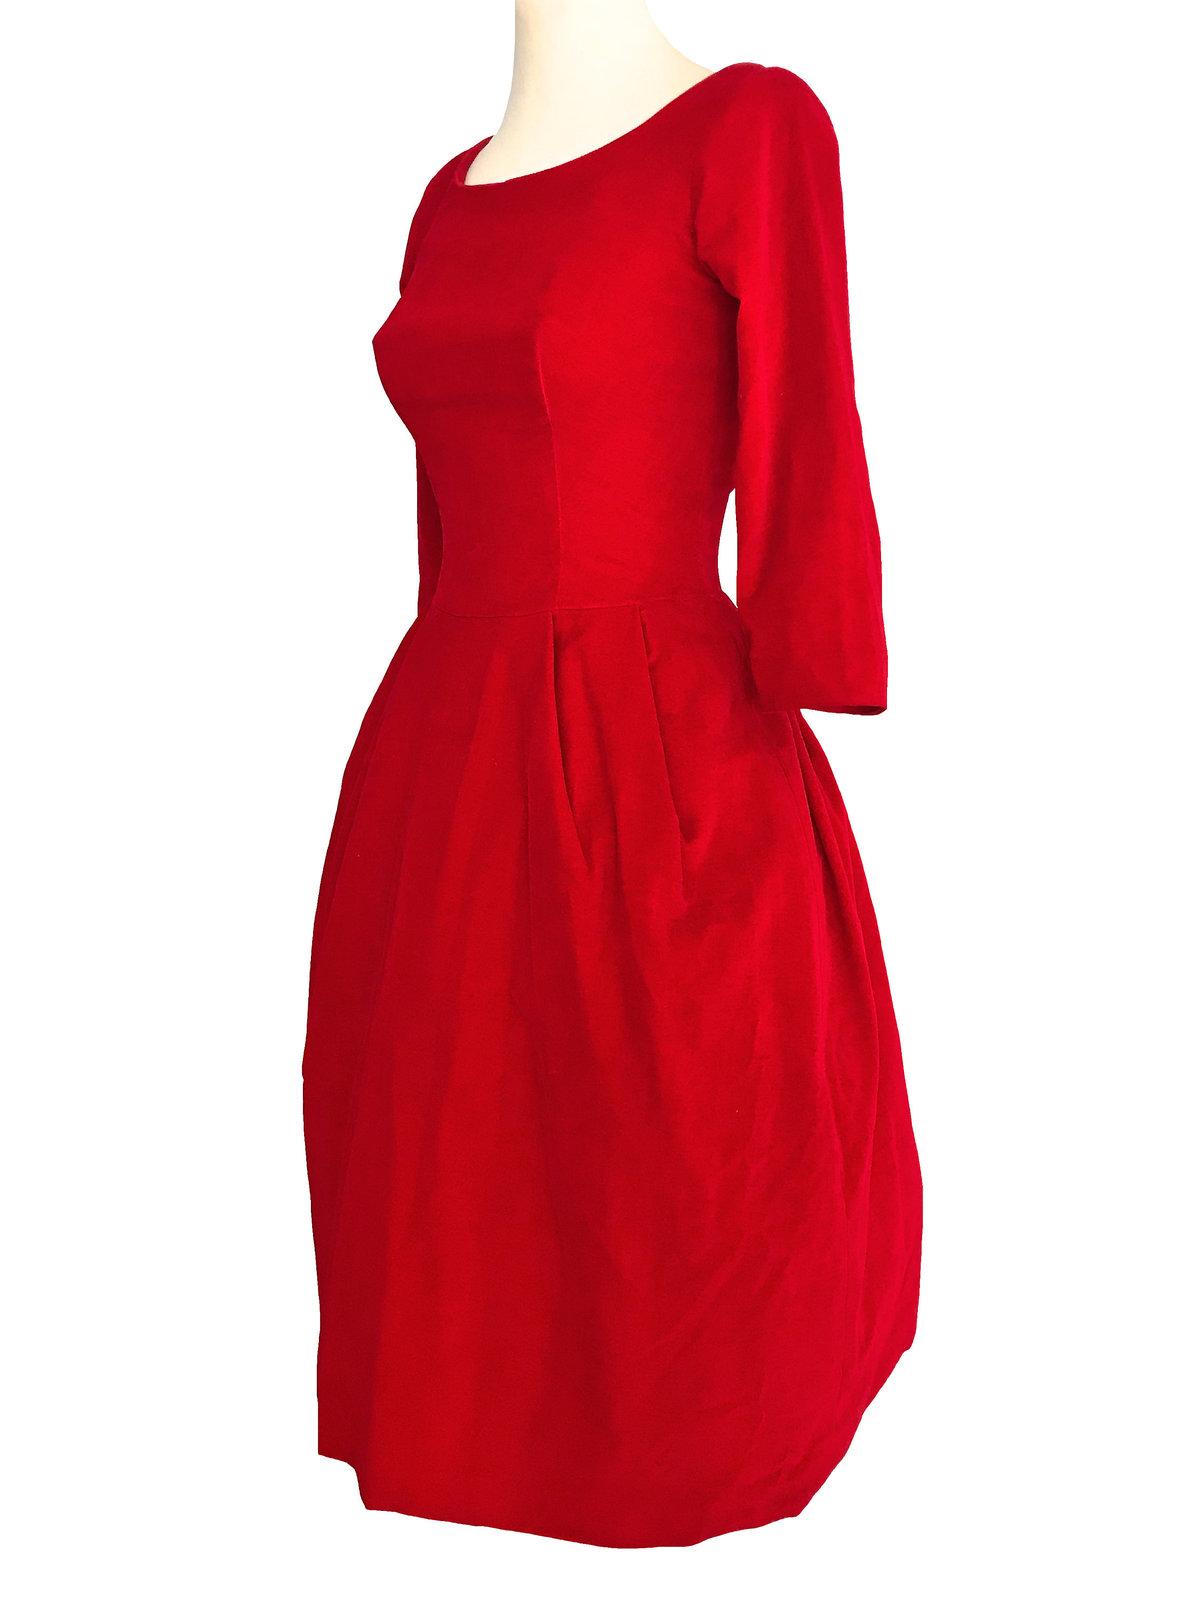 50s Poppy Red Velvet Fit & Flare Xmas Party Bubble Skirt Pin Up Rockabilly Dress